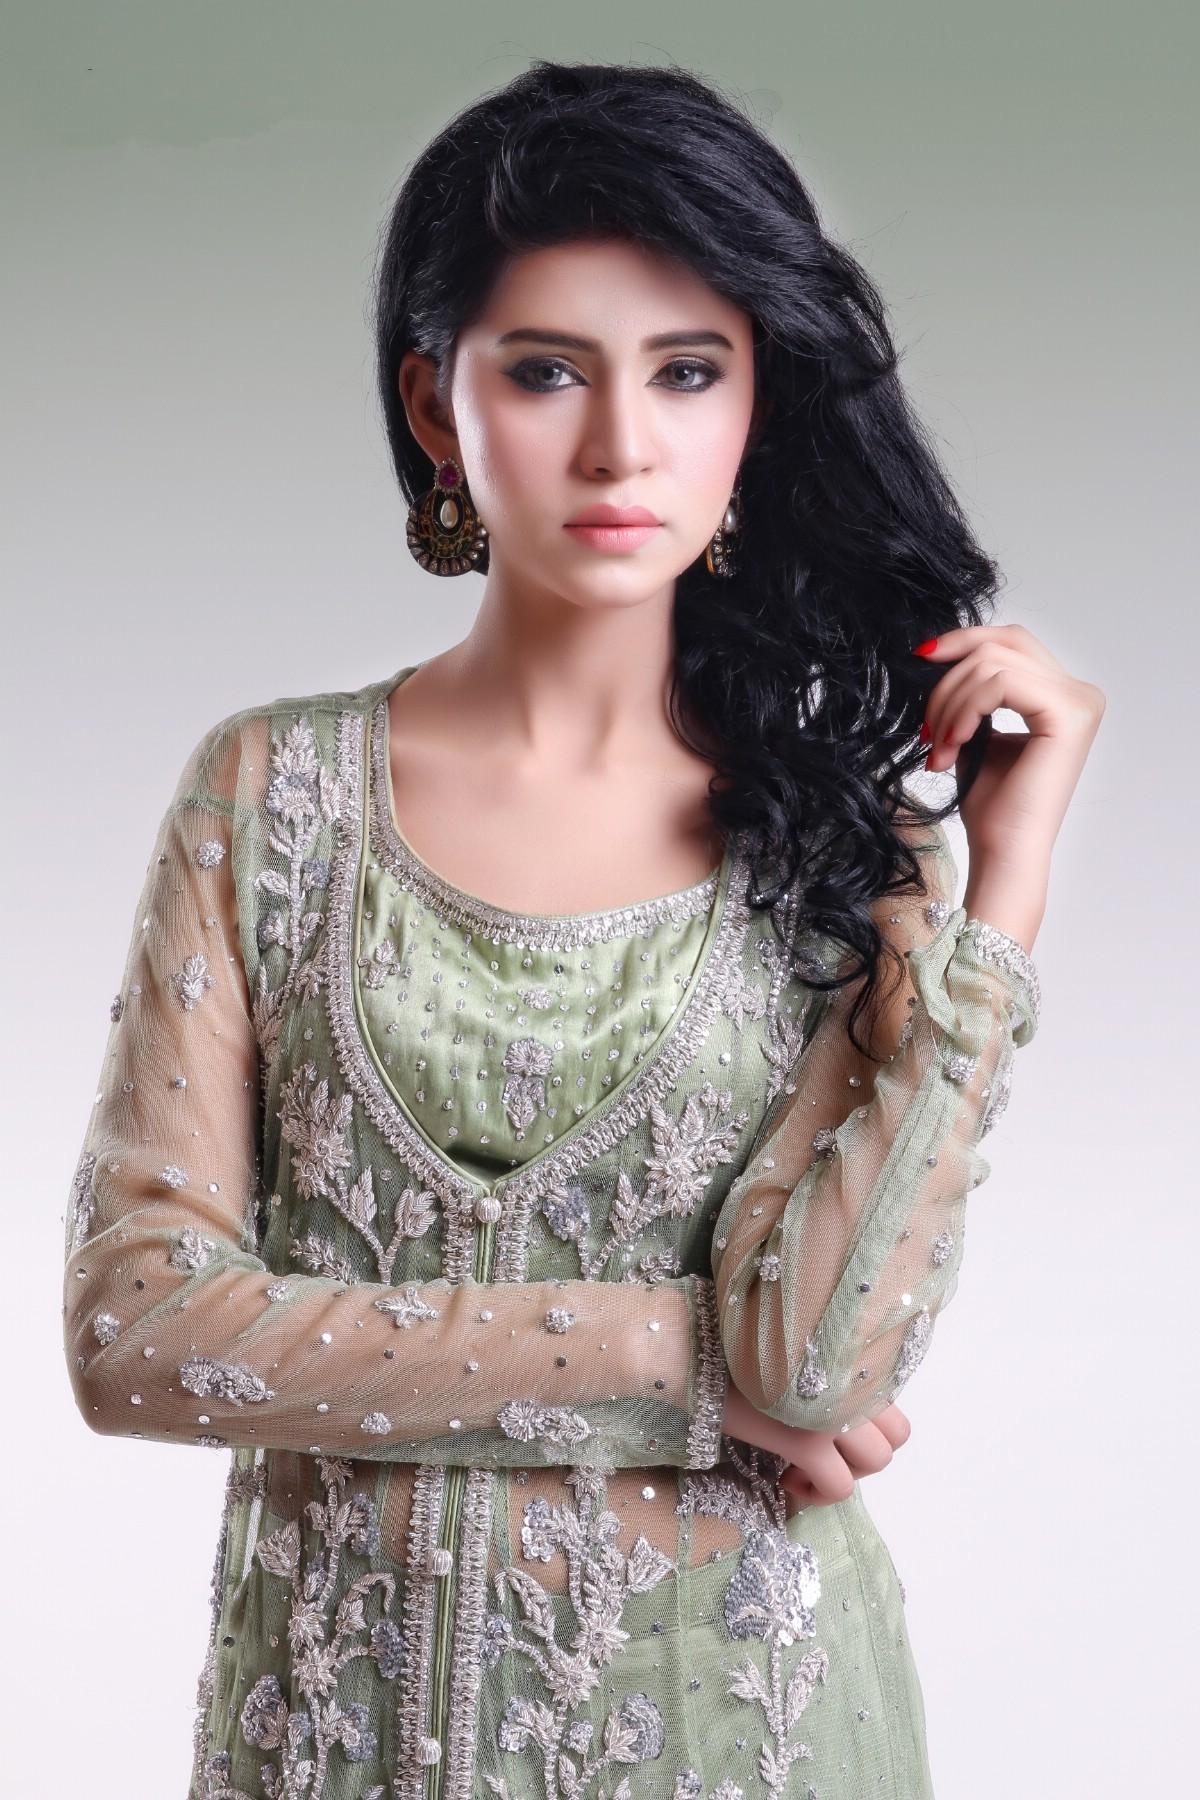 beautiful wedding dress for girls wedding dresses for girls beautiful wedding dress for girls